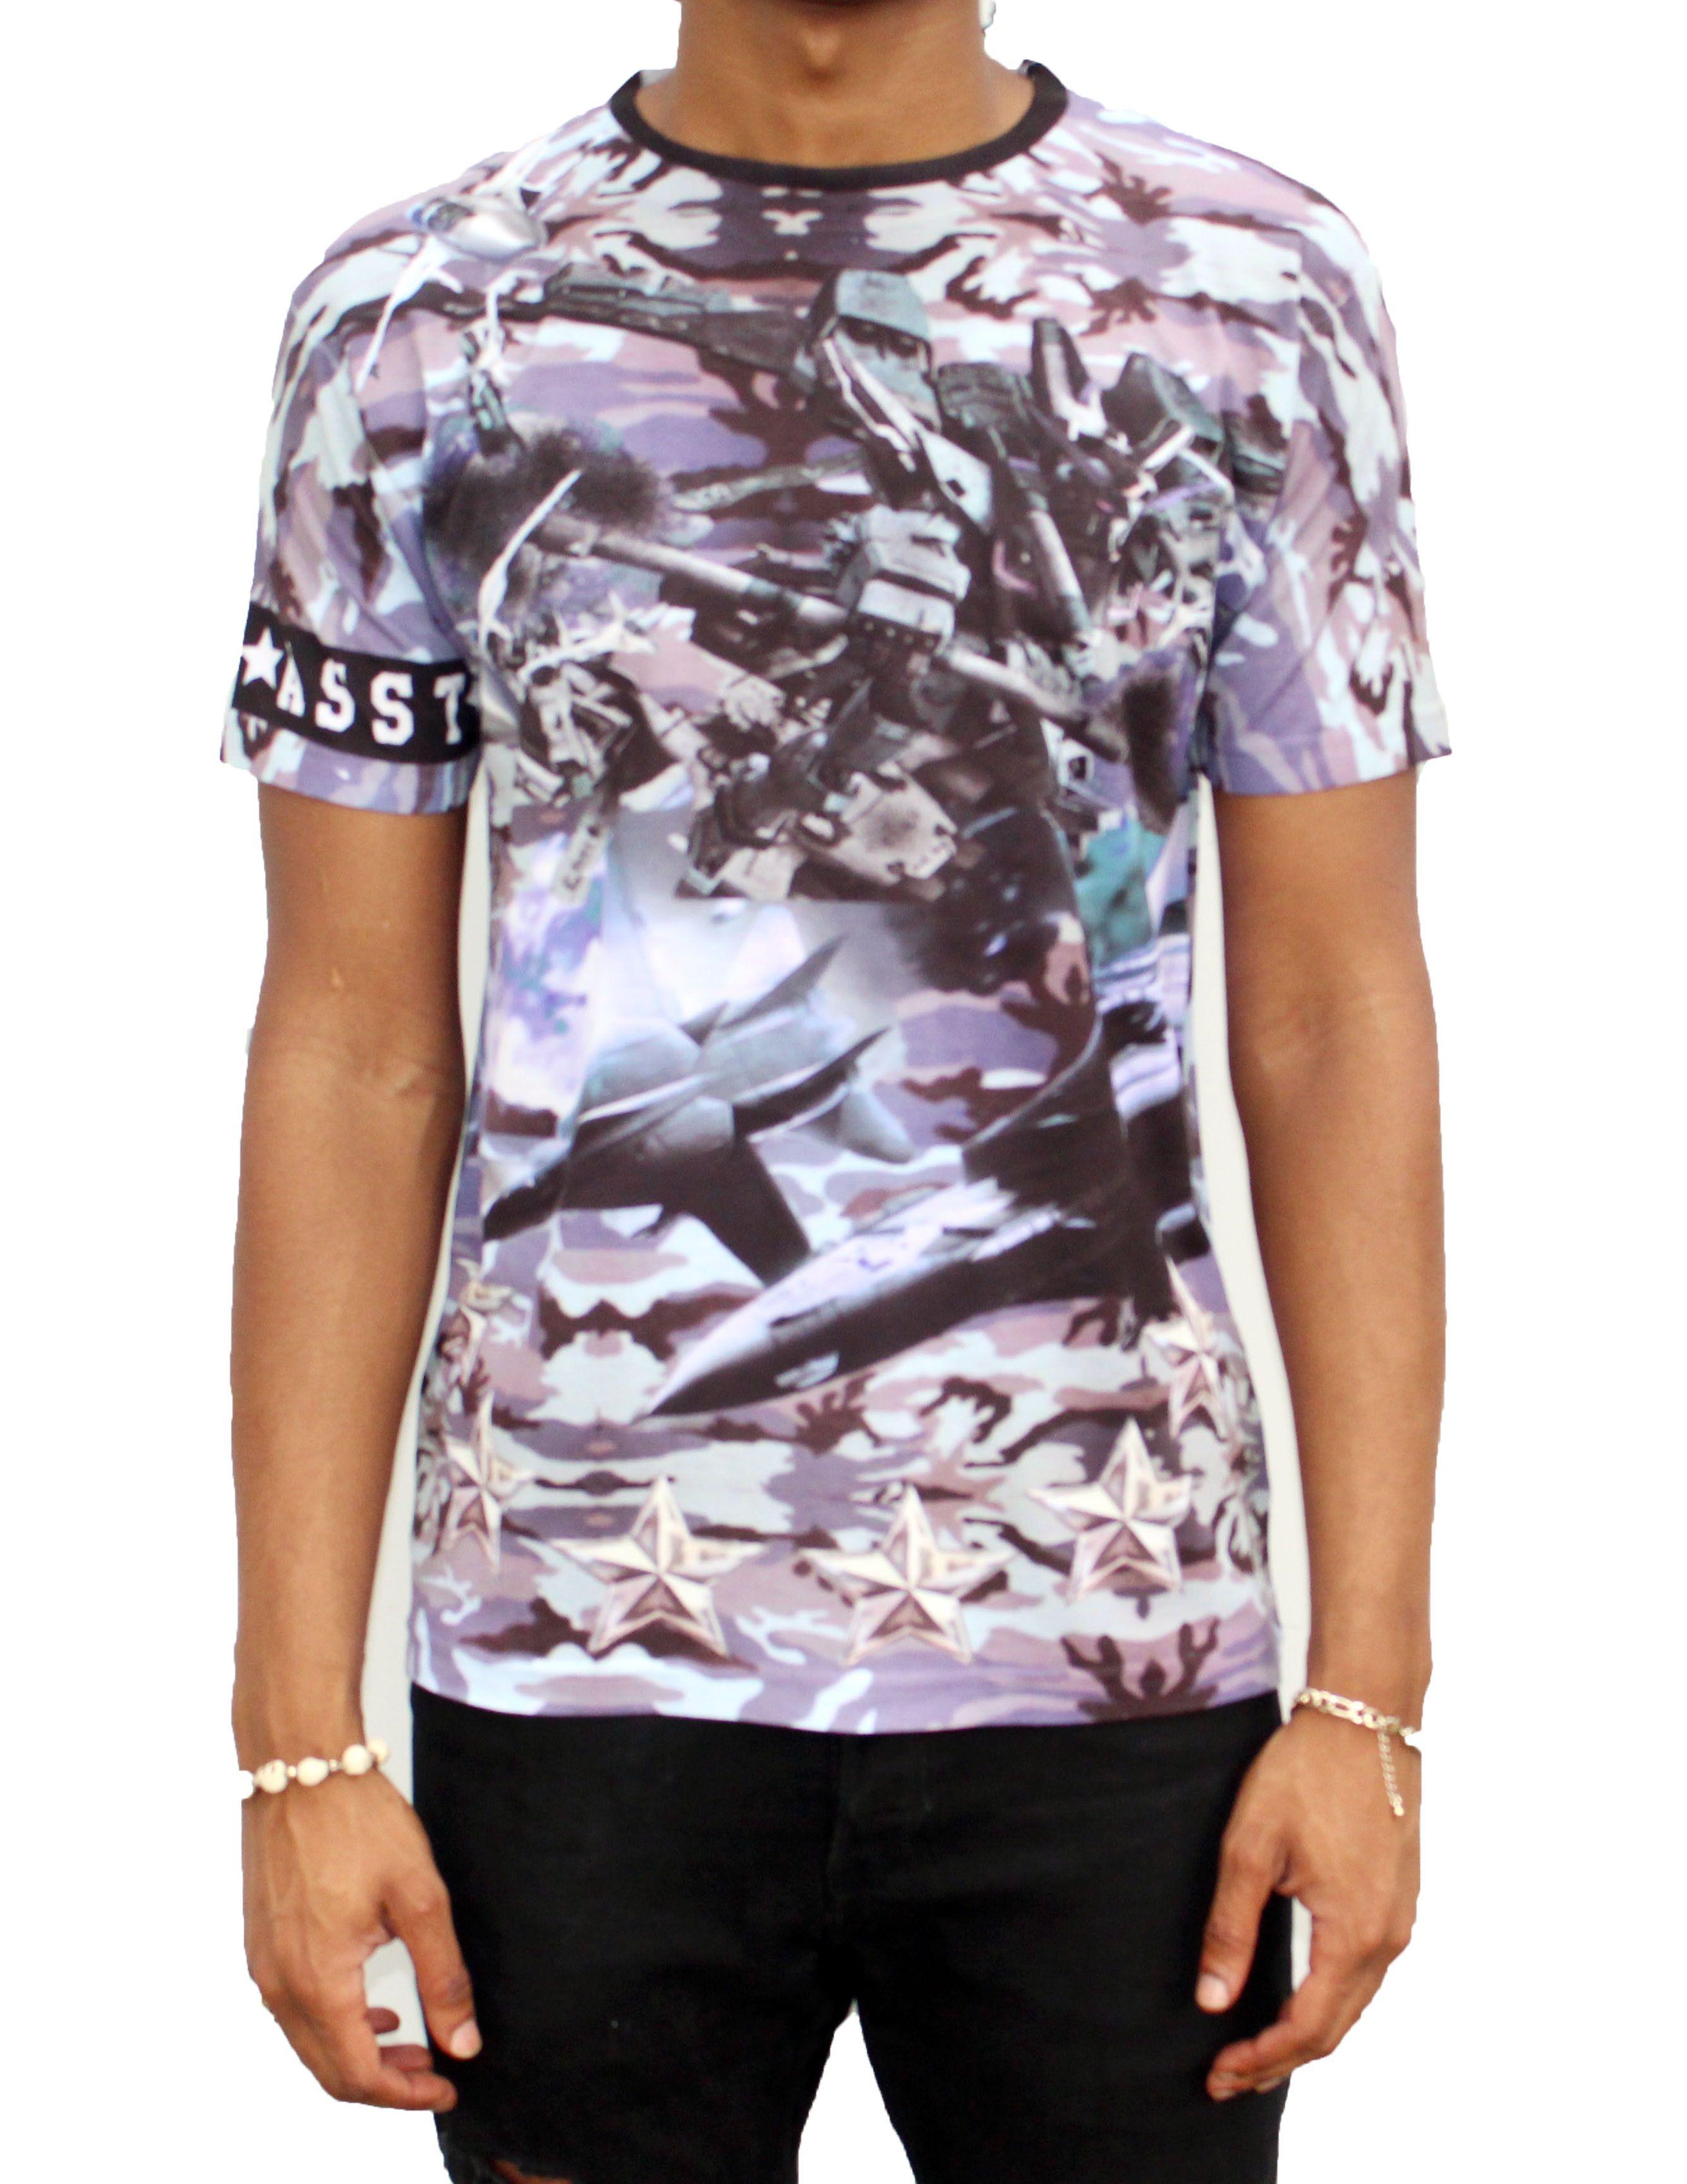 460d6d35ce9e4 Underground Outfits Feature: © Asst Clothing - Gundam T-shirt -- Visit our  online store at: shop.undergroundoutfits.com. -- #streetwear #urban # clothing ...